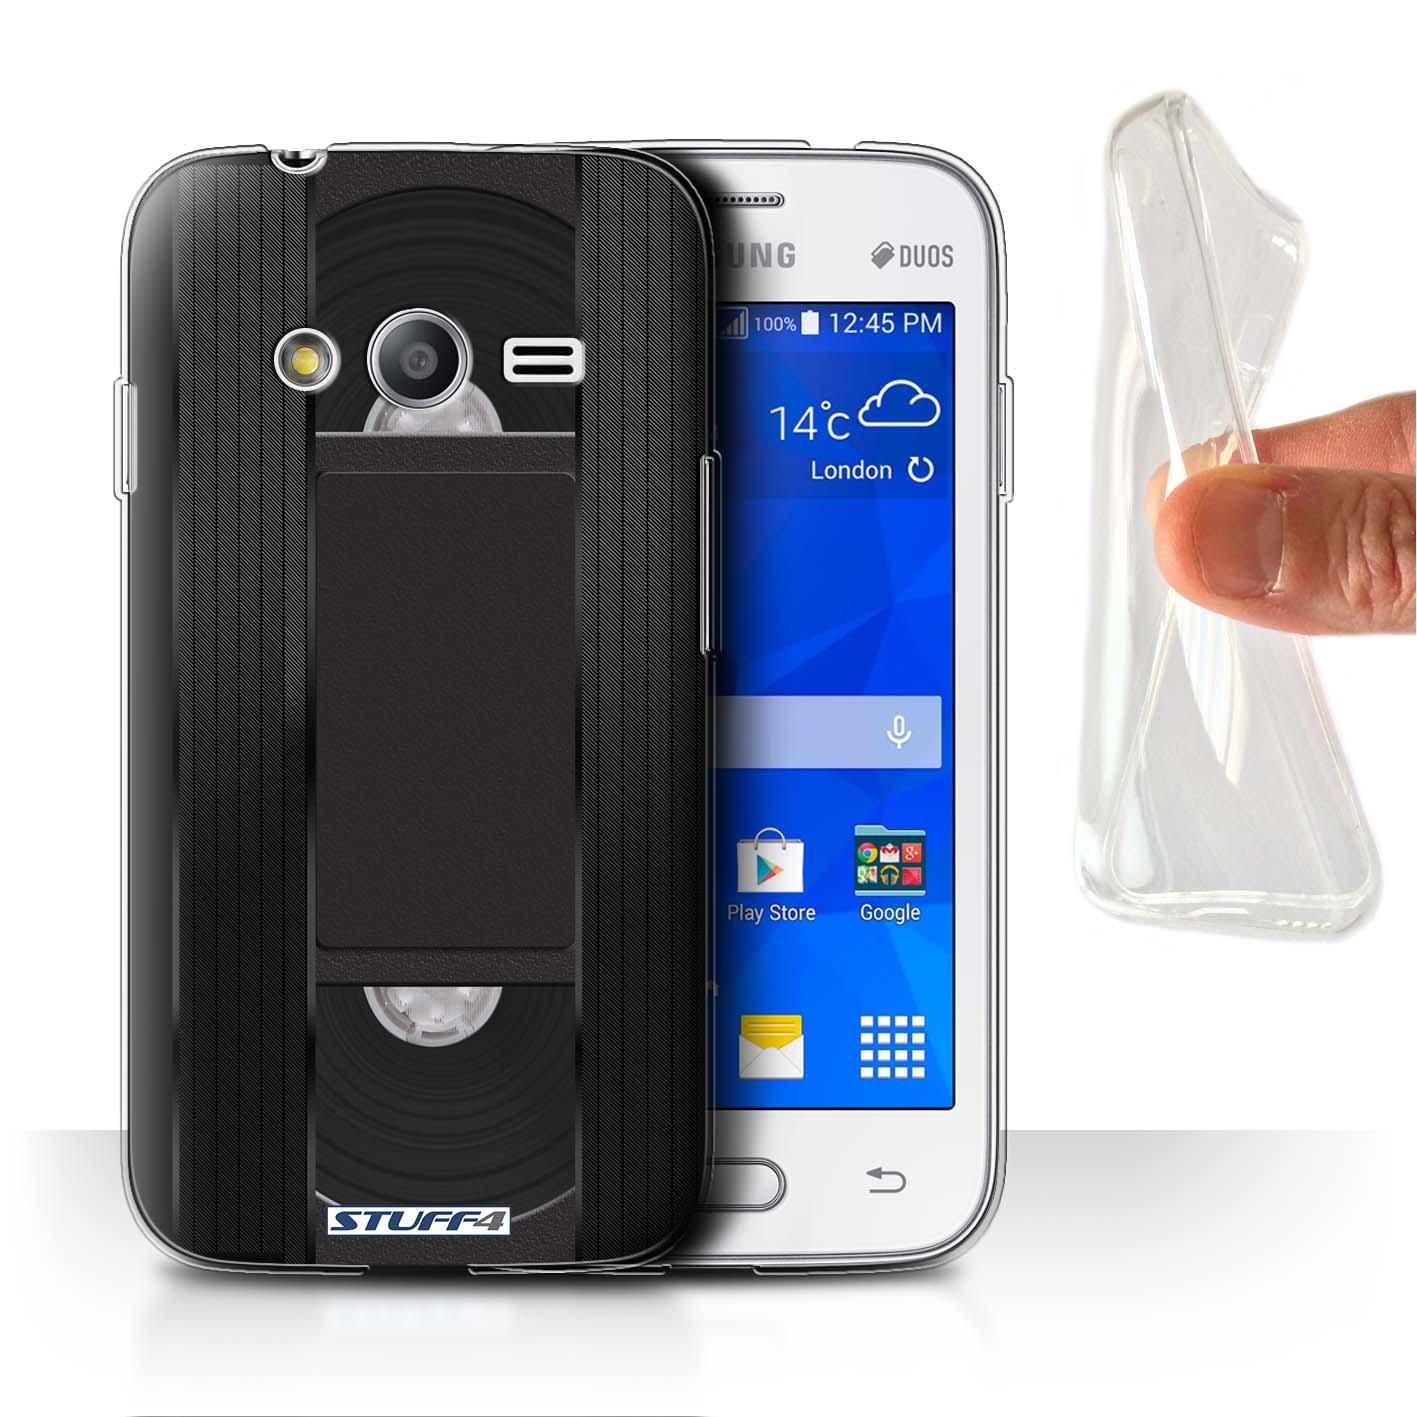 Stuff4 Gel Tpu Case Cover For Samsung Galaxy V Plus G318 Retro Tech